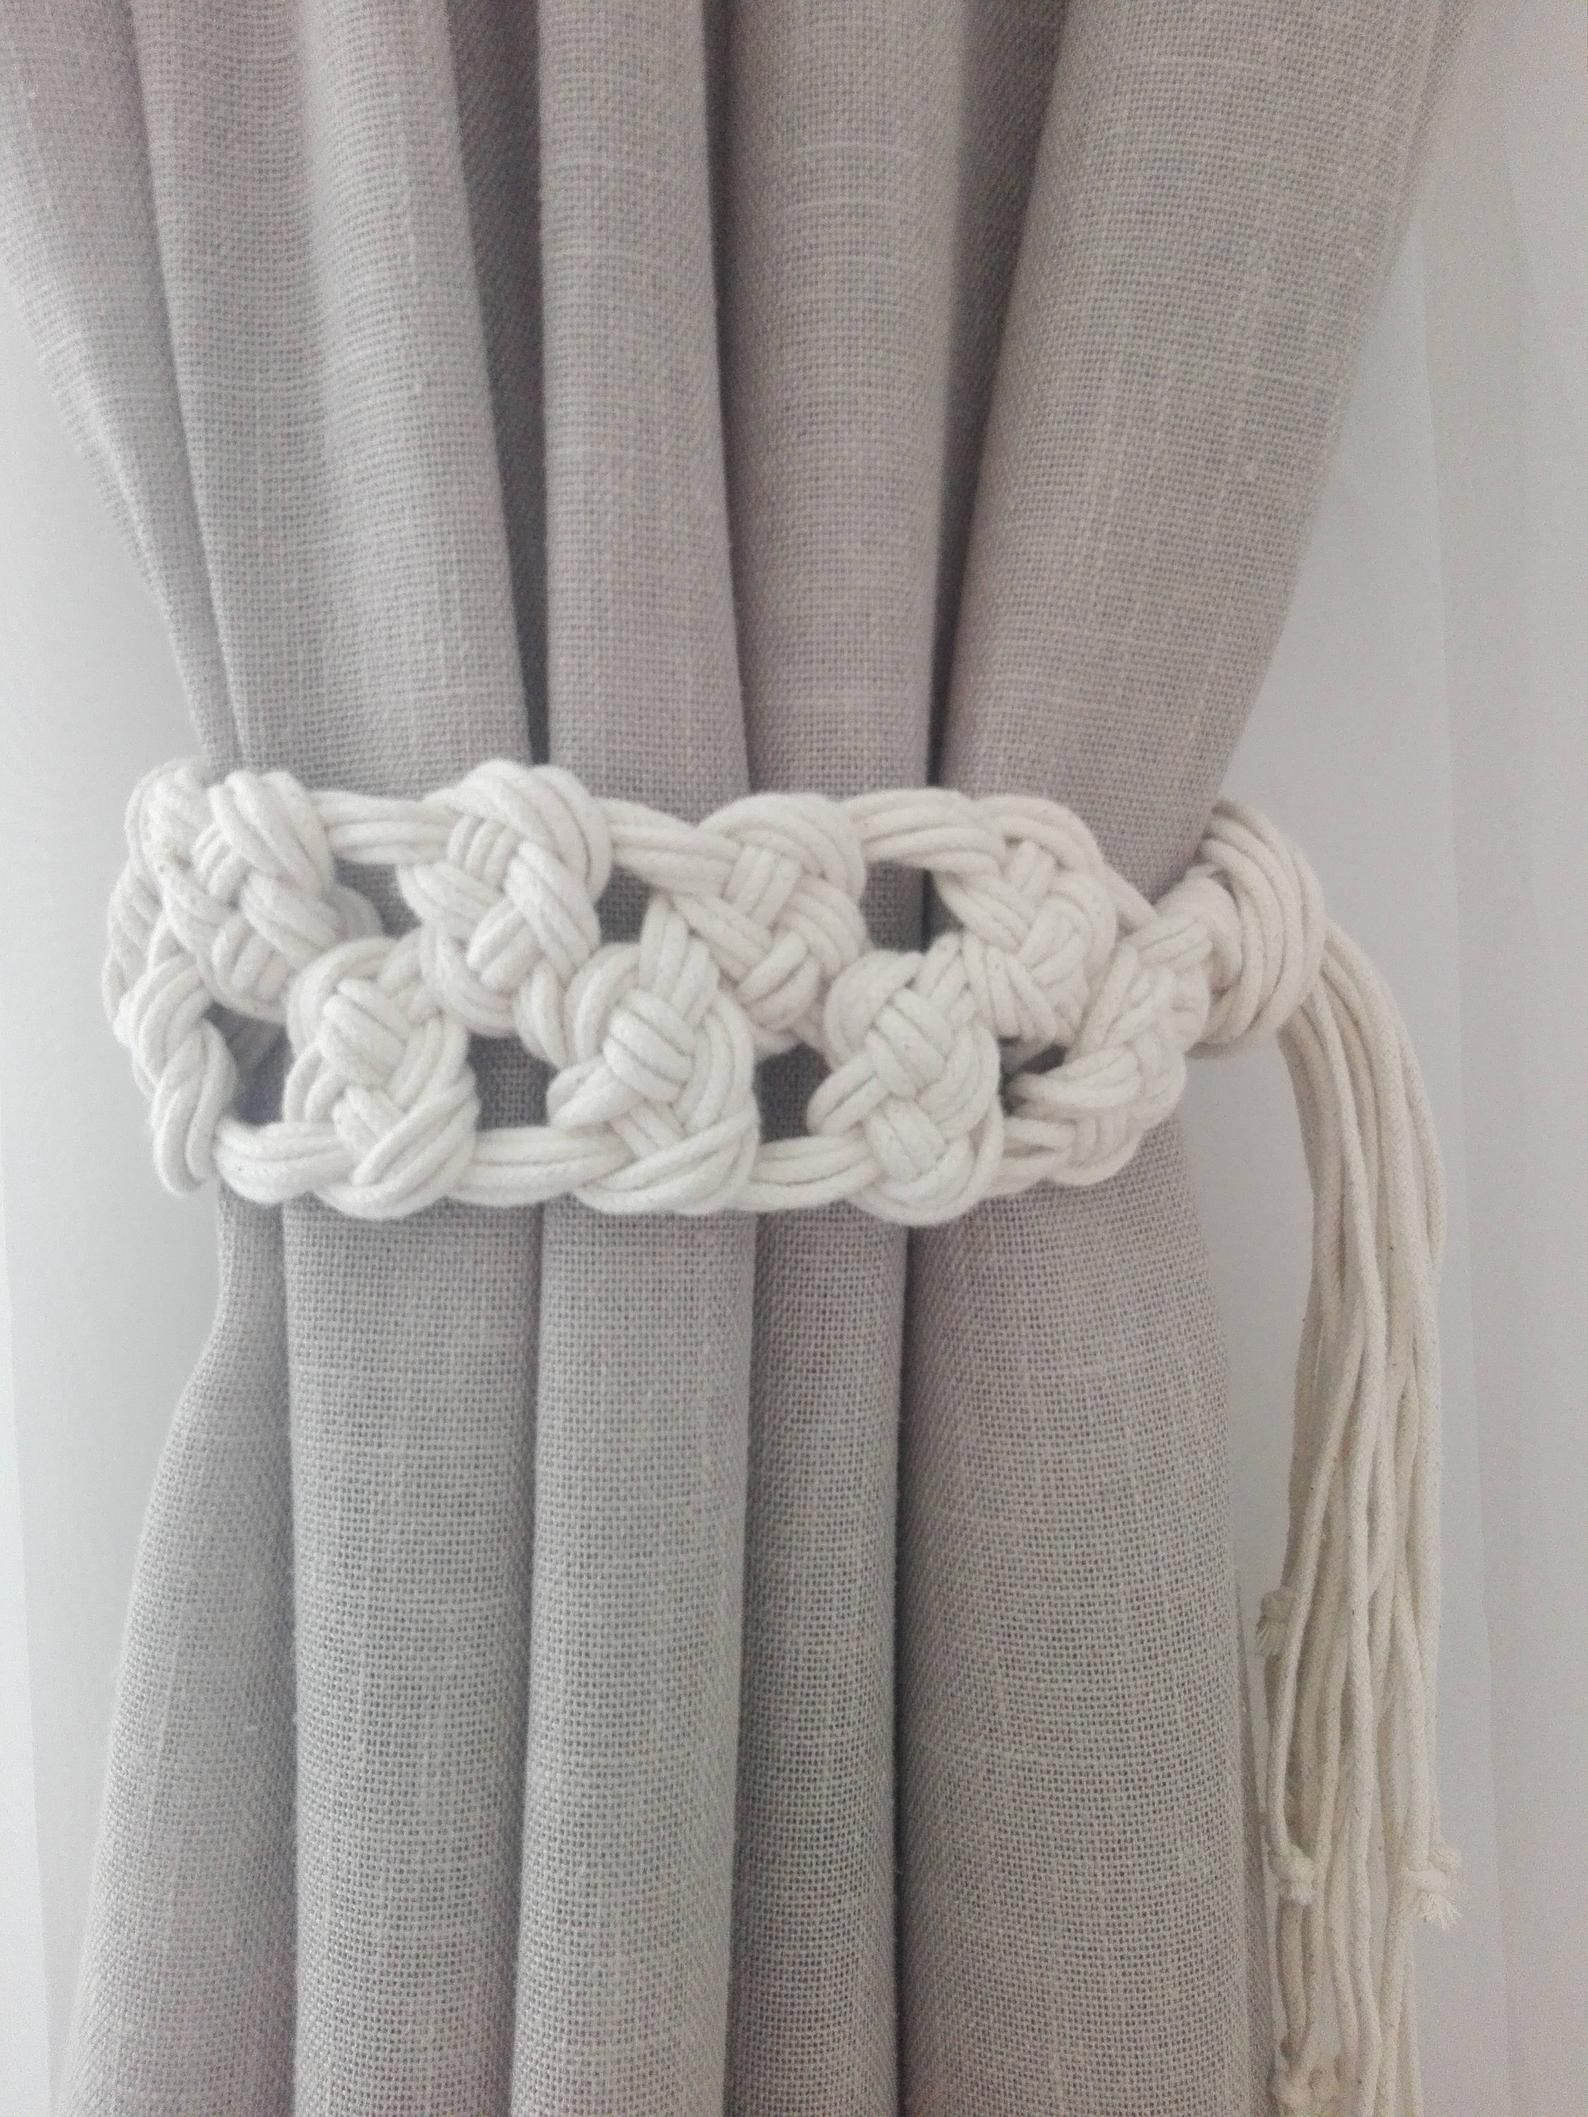 Macrame Curtain Tie Backs 2 Pcs Cotton Rope Curtain Tie Backs Nursery Curtain Tie Backs Curtain Holdbacks White